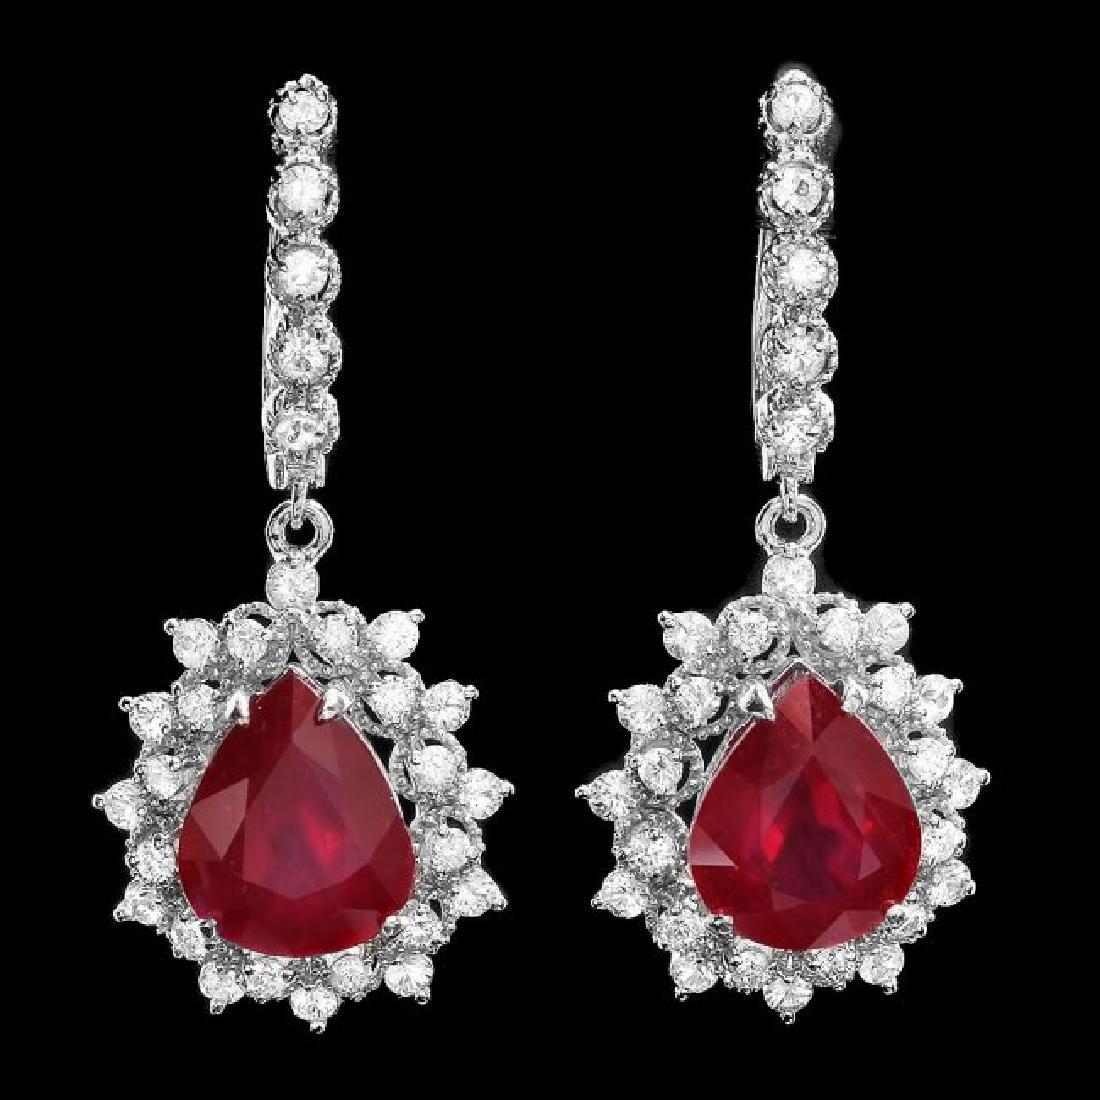 14k Gold 1.50ct Ruby 2.00ct Diamond Earrings - 2